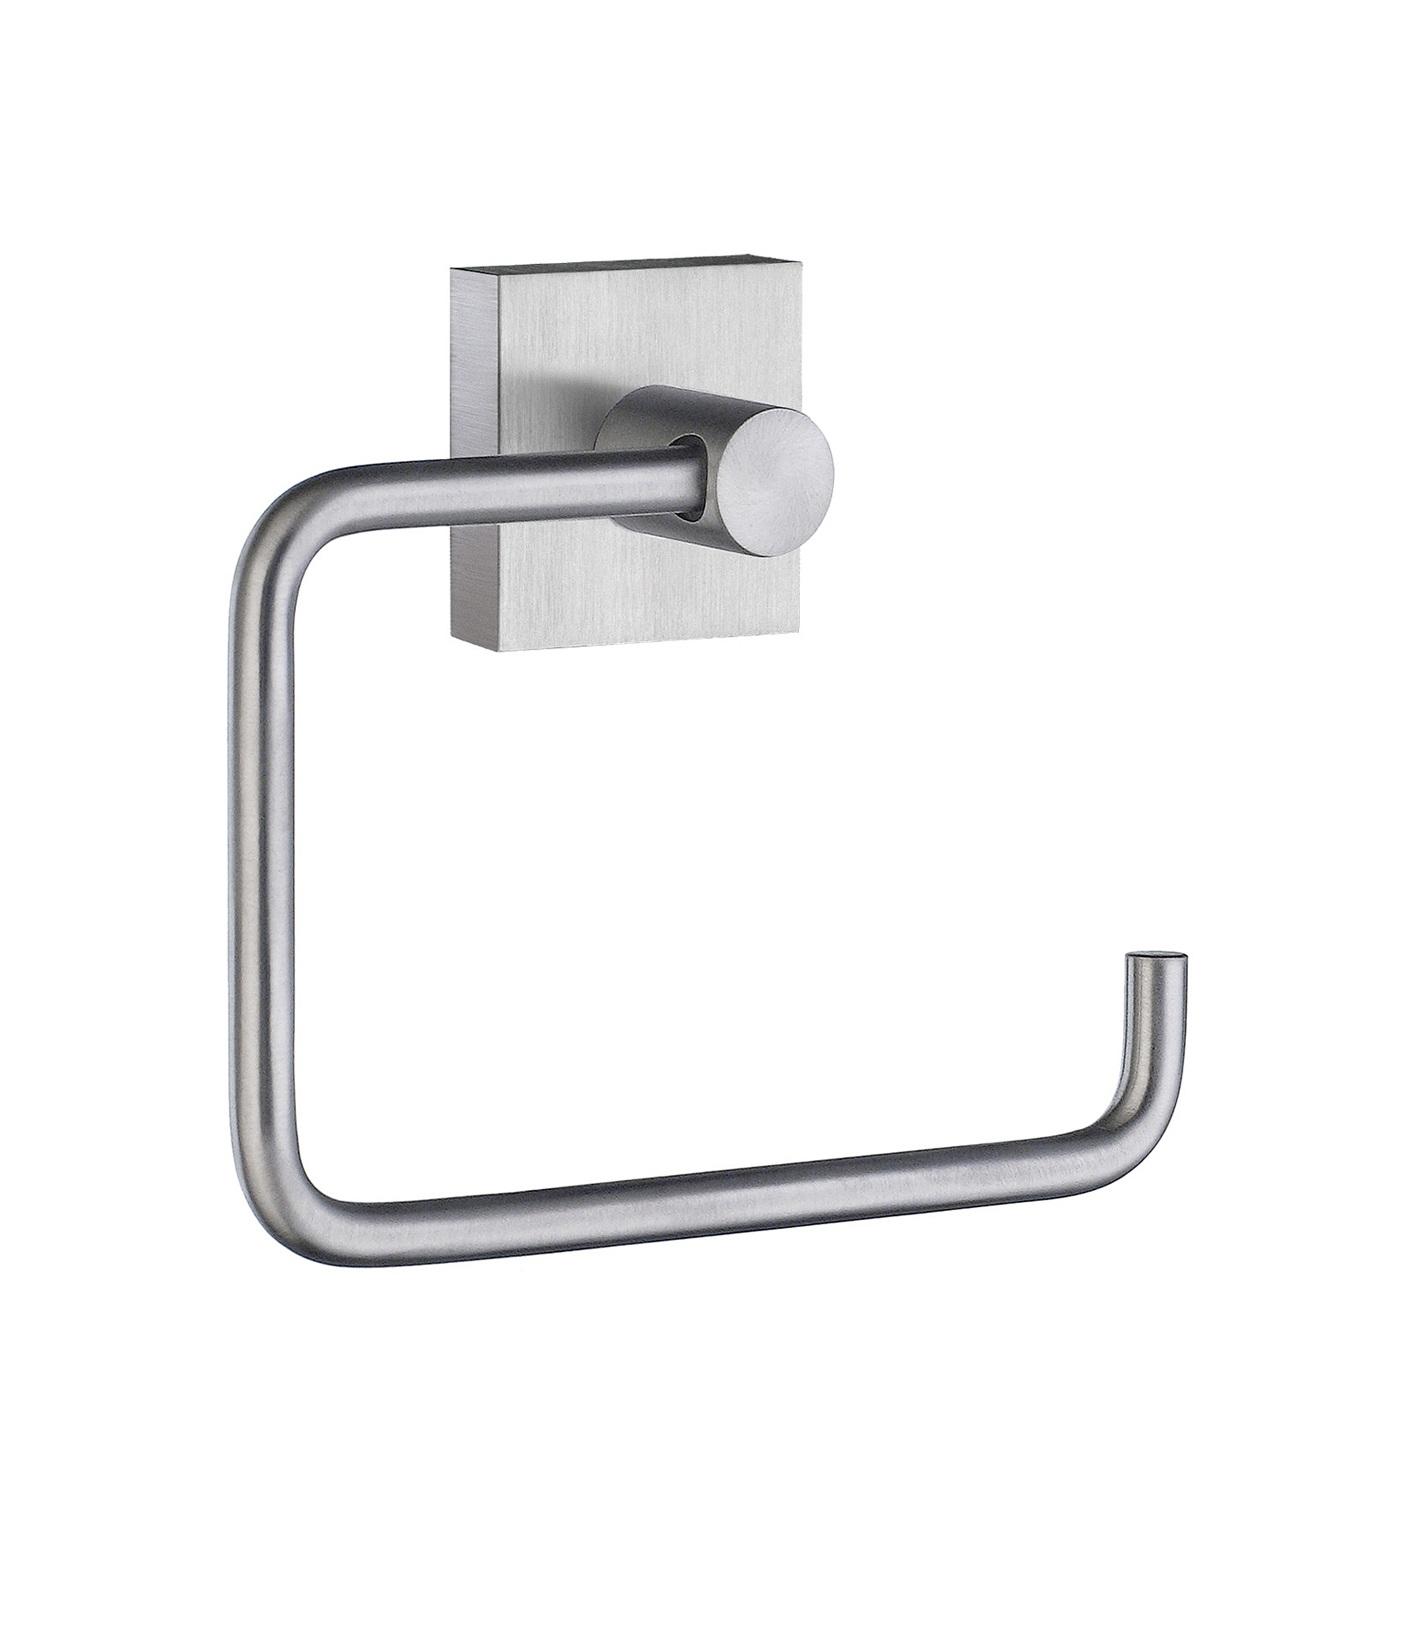 SMEDBO HOUSE WC-Papierhalter ohne Deckel RS341